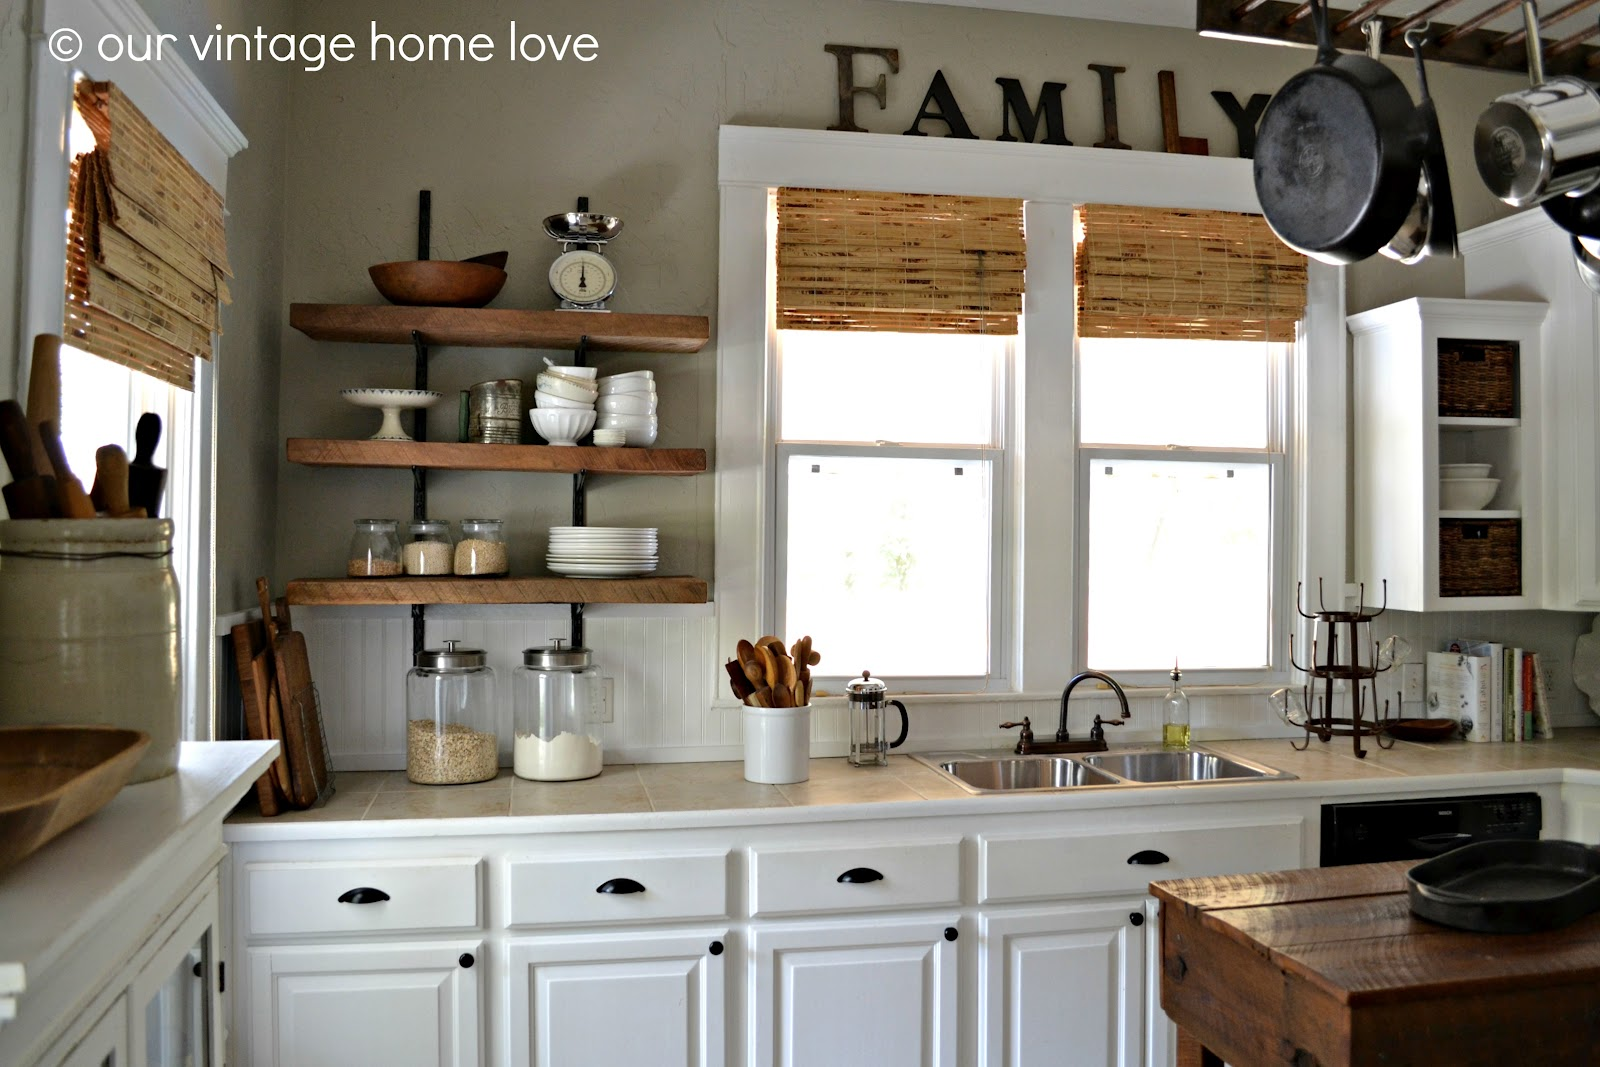 vintage home love: Reclaimed Wood Kitchen Shelving - Reveal